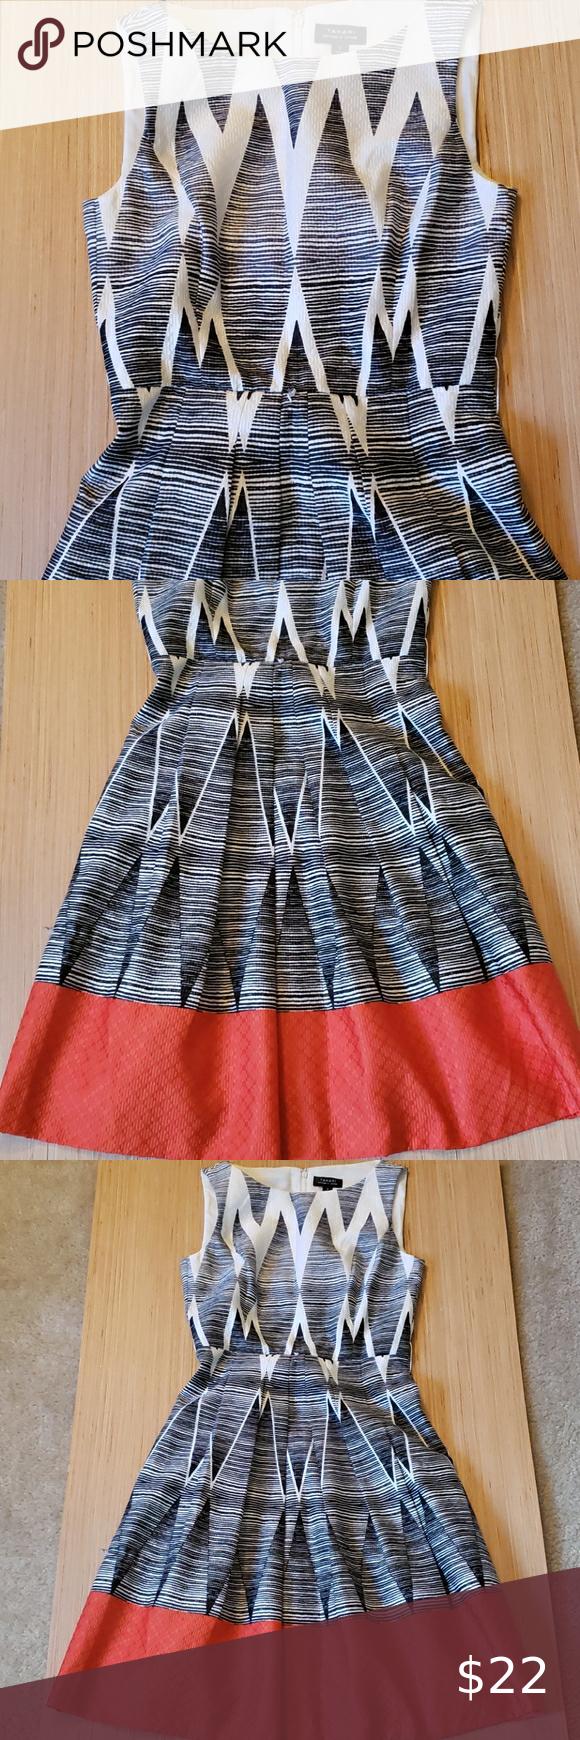 Euc Tahari Black White And Red Dress Sz 2 Cap Sleeve Shift Dress Embroidered Shift Dress Blue Mini Dress [ 1740 x 580 Pixel ]